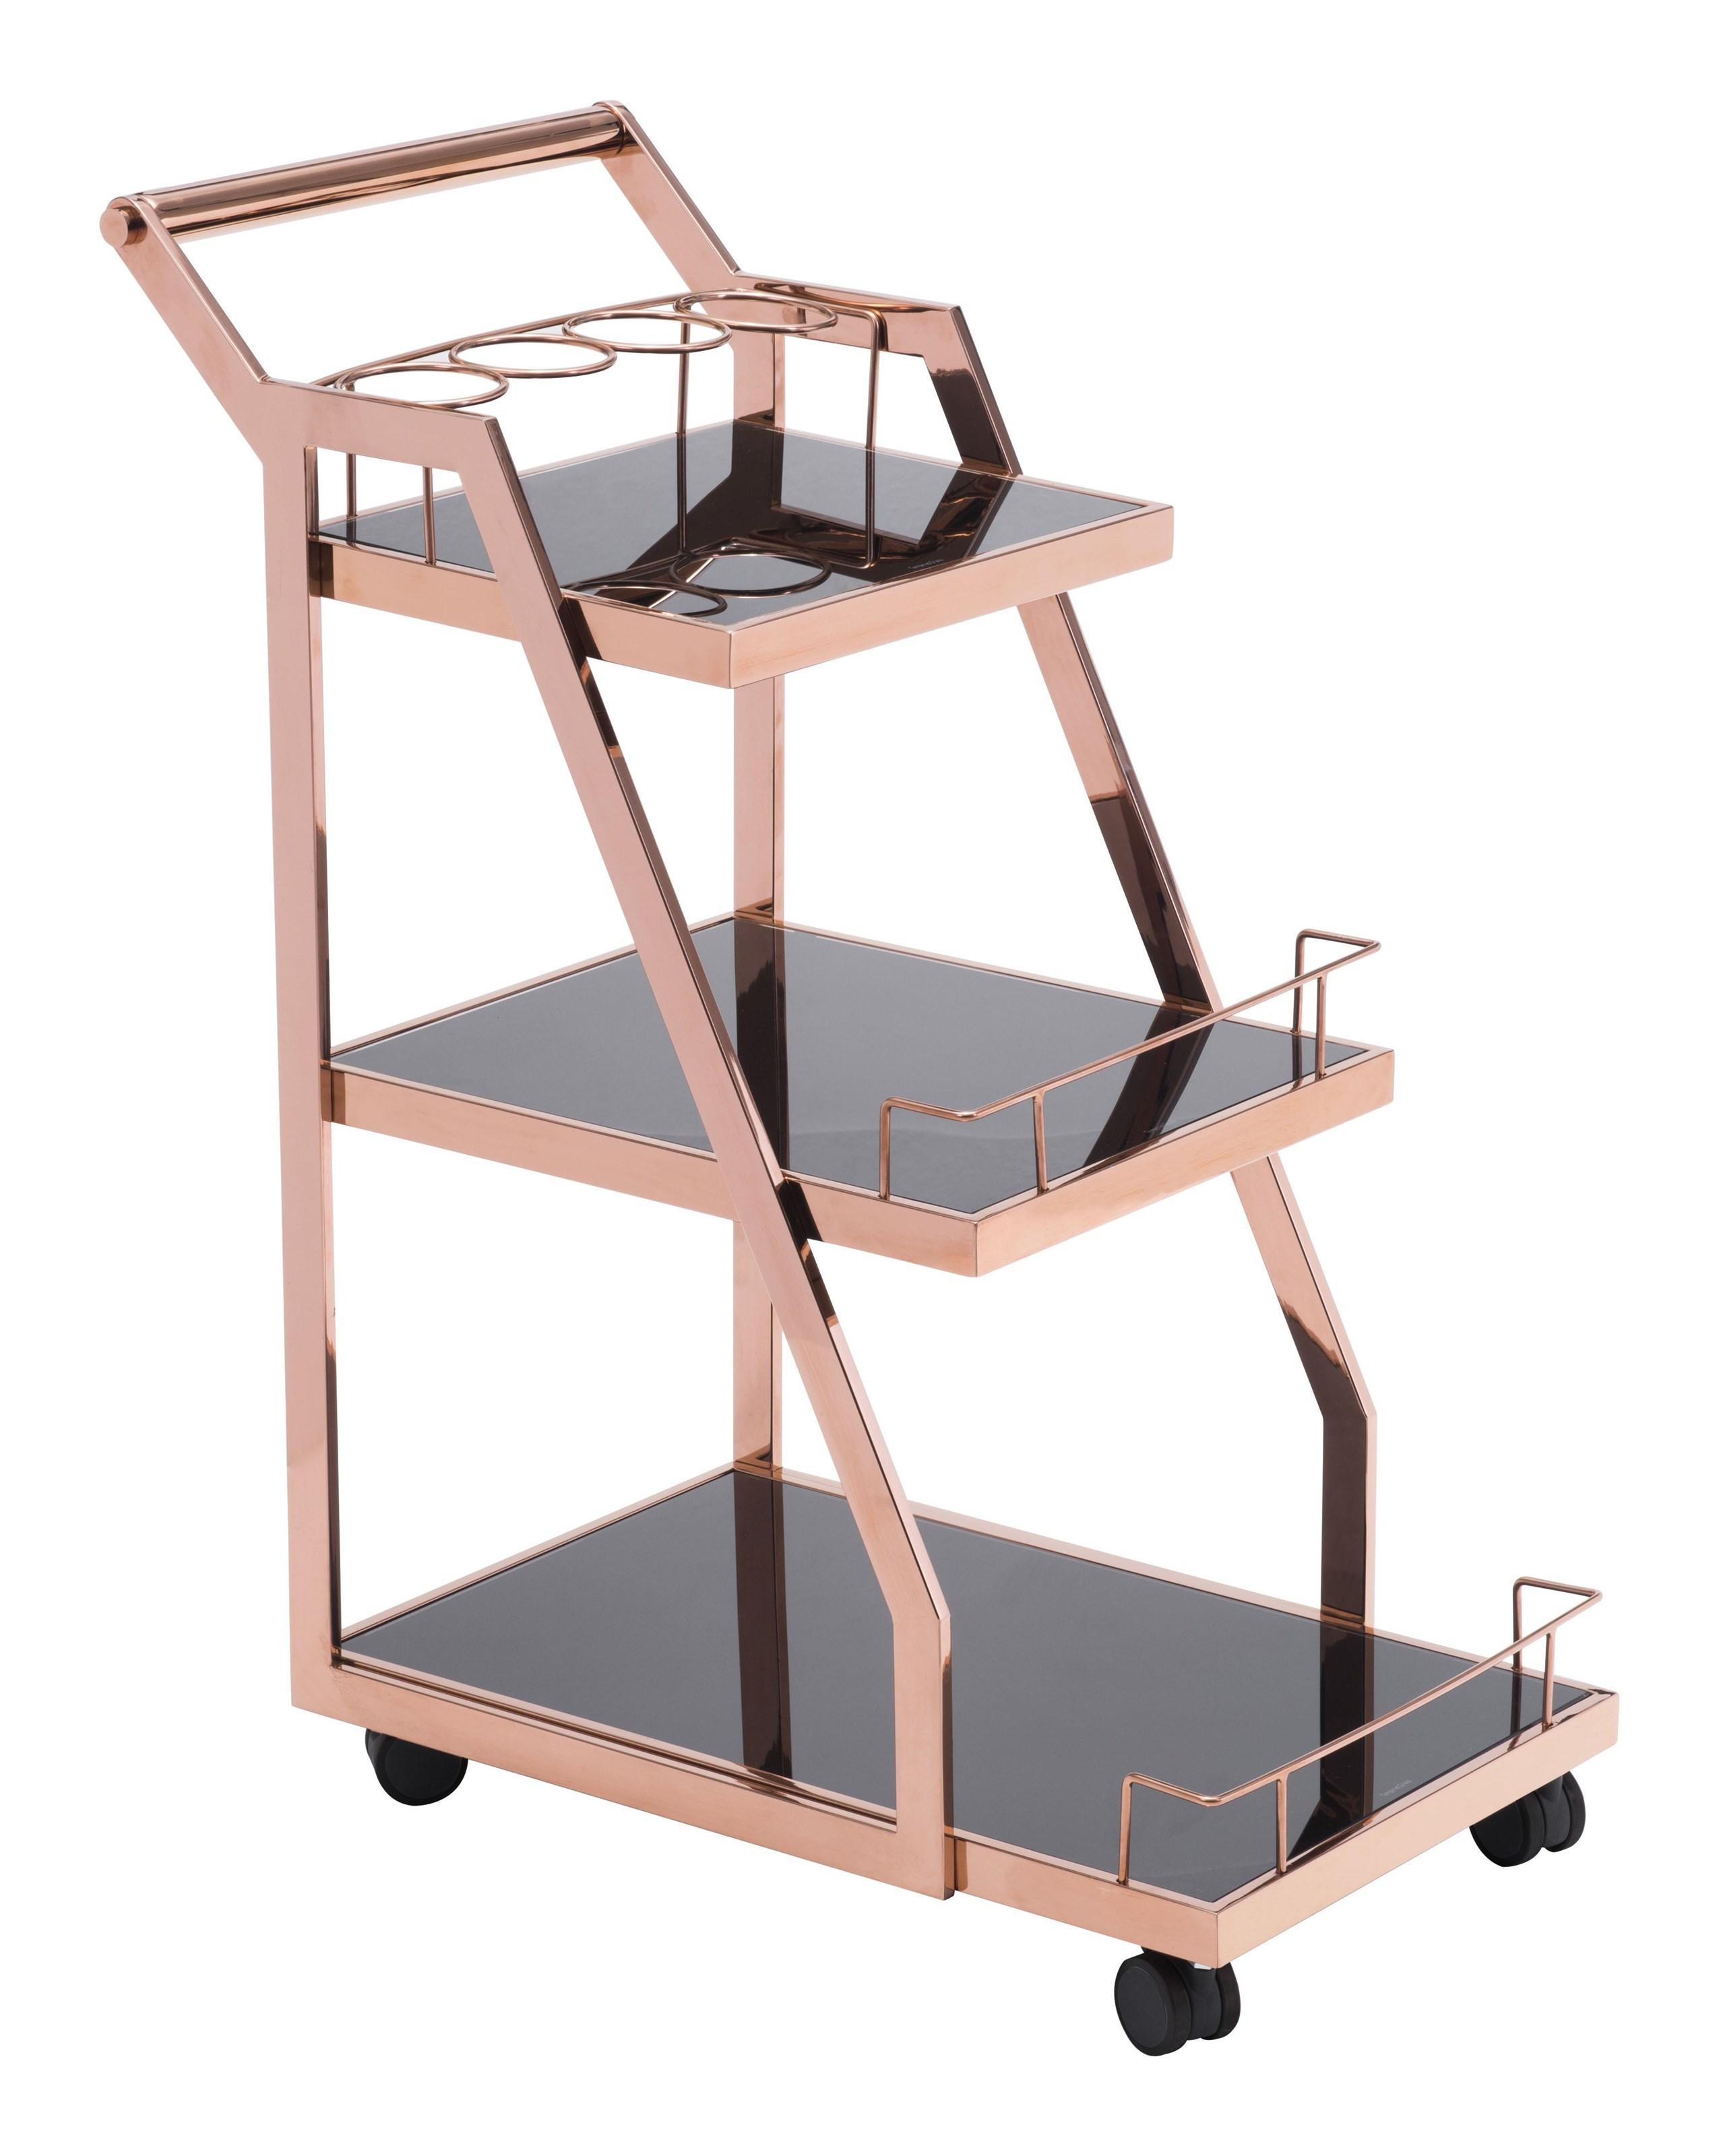 Zuo Acropolis Serving Cart - Item Number: 100368